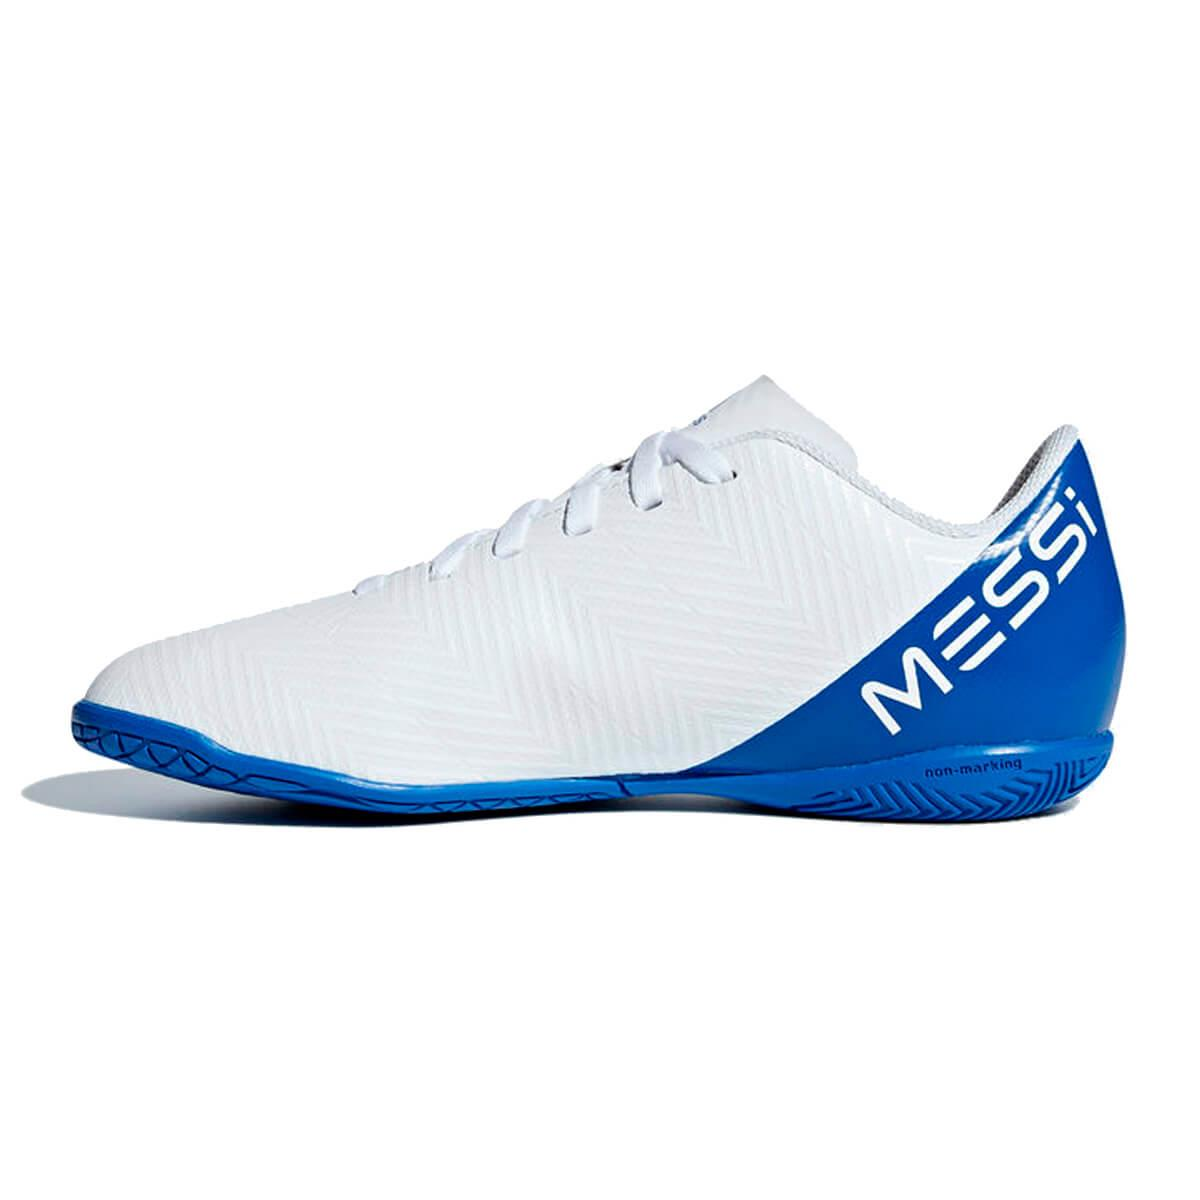 81c97174da Chuteira Futsal Adidas Nemeziz Messi Tango 18.4 Infantil Branca e Azul